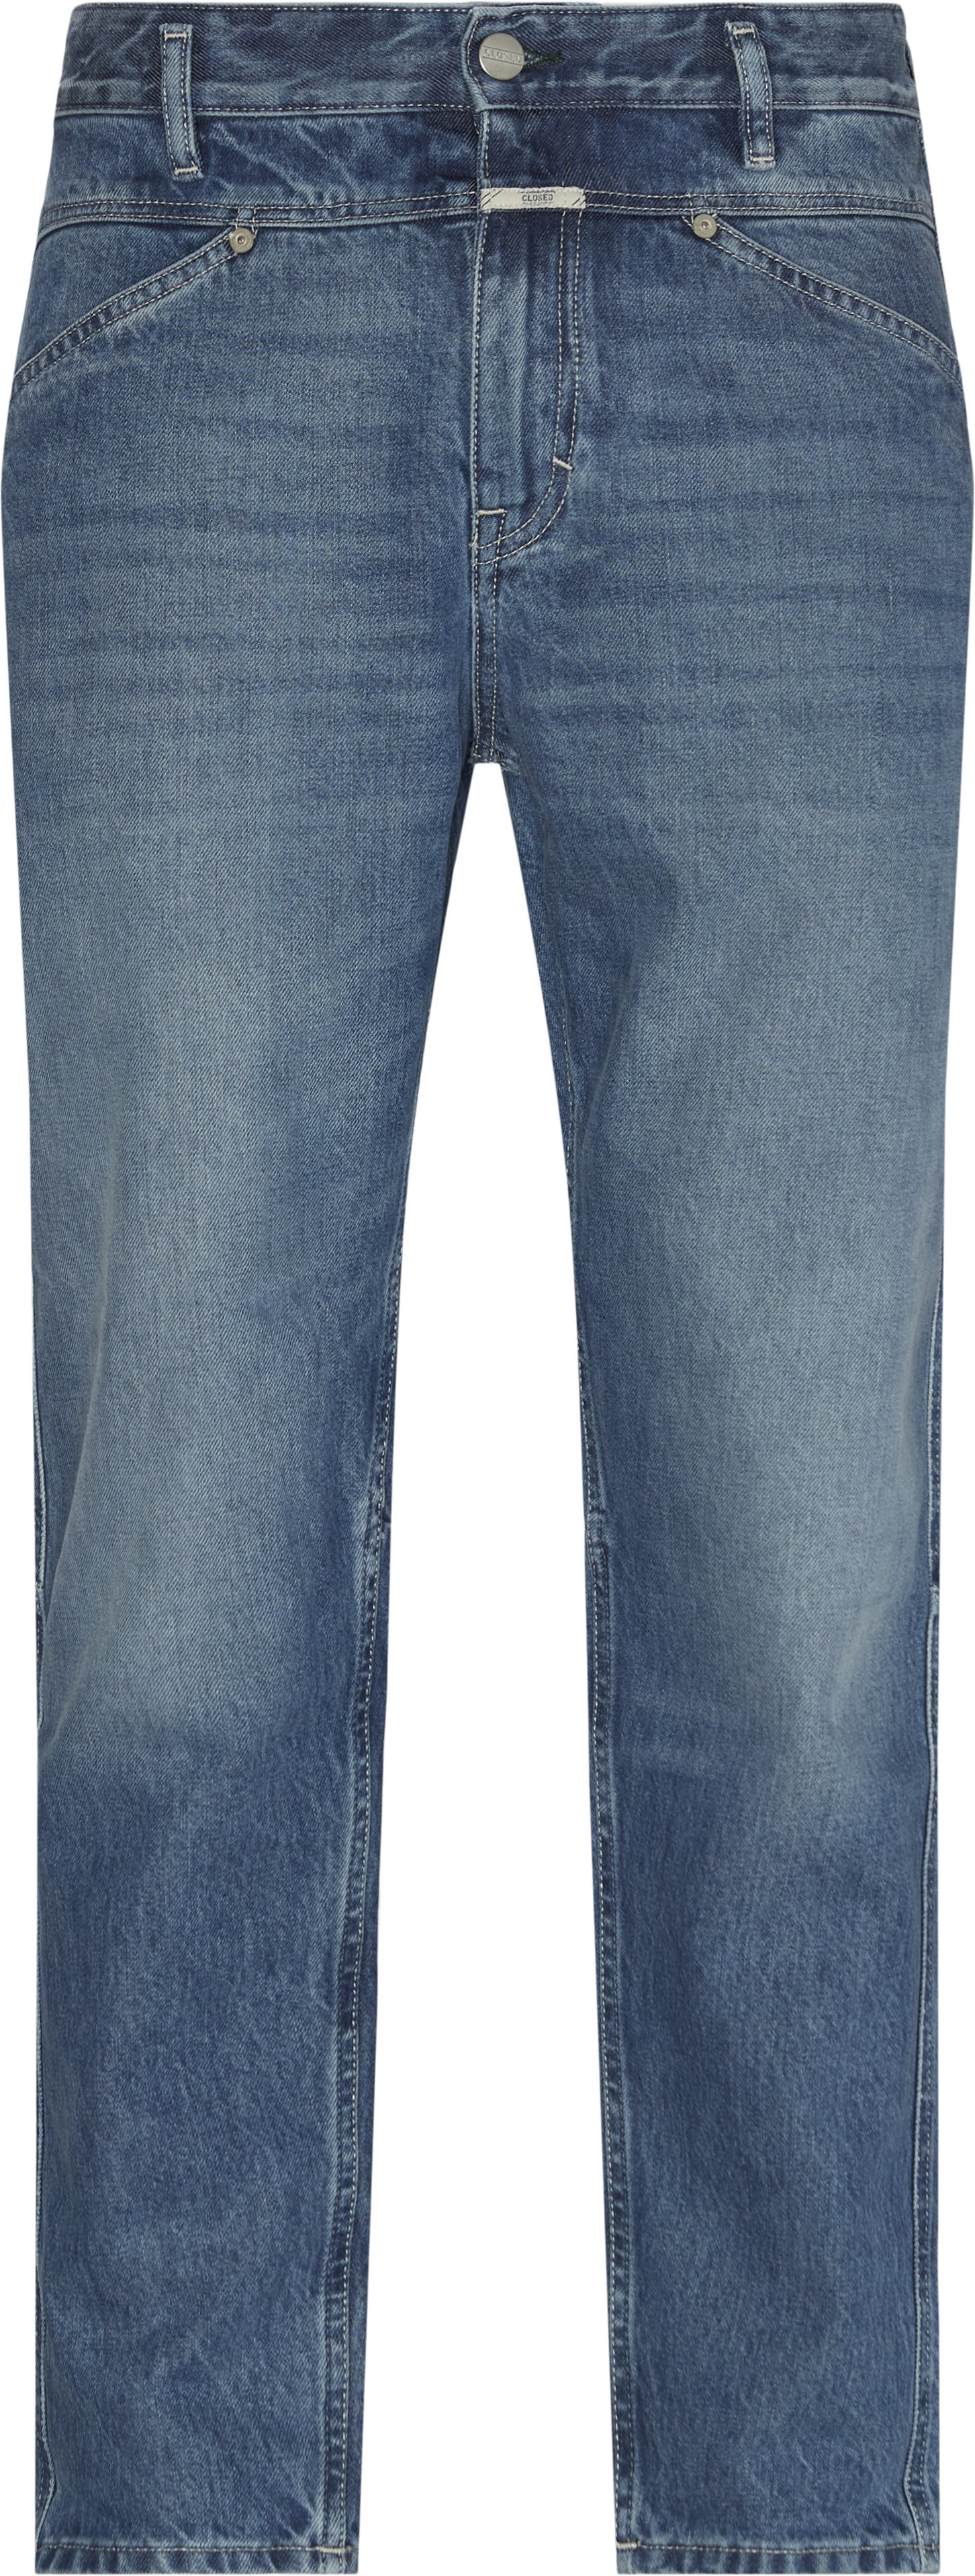 Cropped Jeans - Jeans - Loose fit - Blå